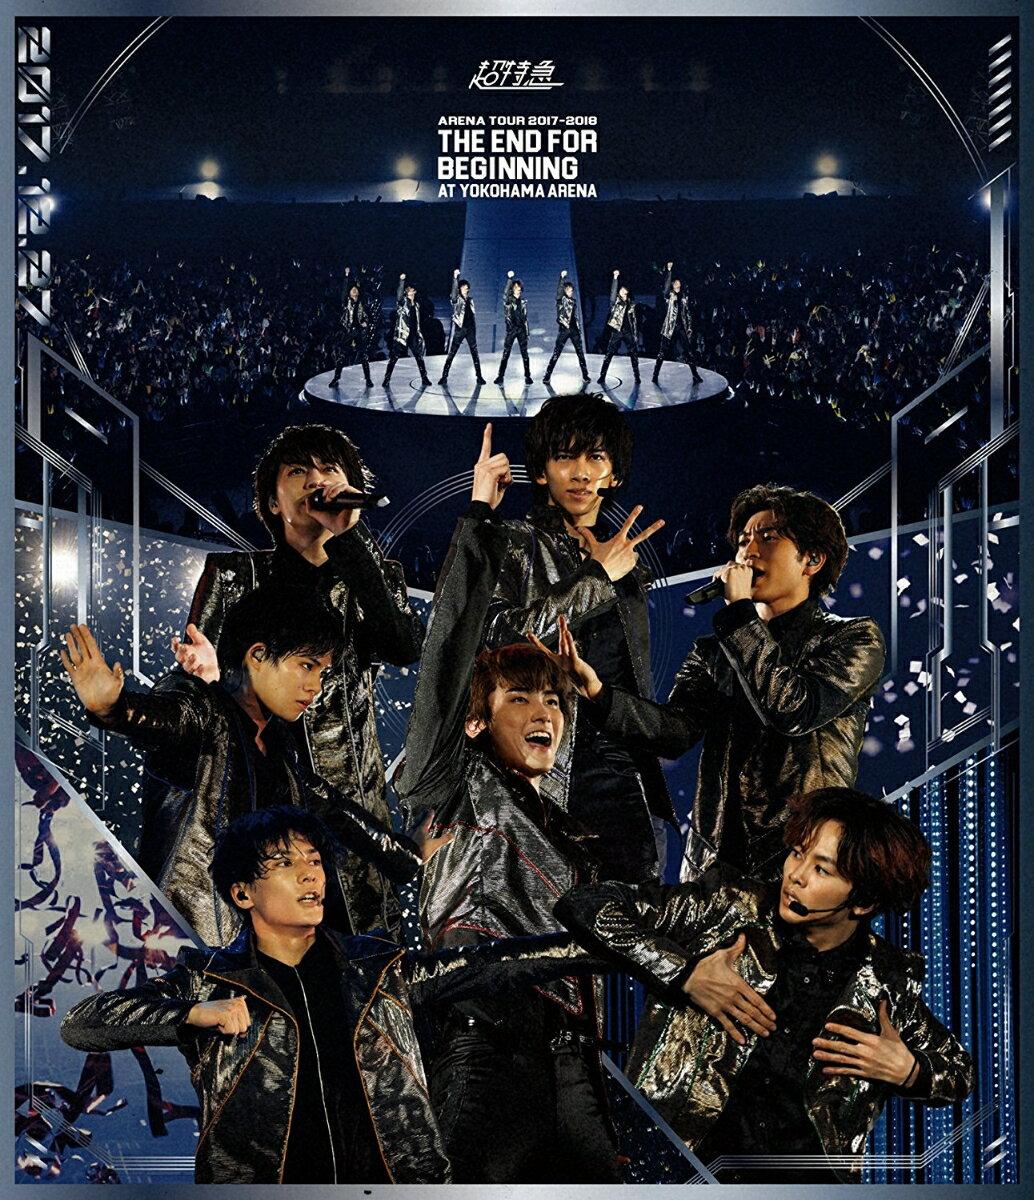 BULLET TRAIN ARENA TOUR 2017-2018 THE END FOR BEGINNING AT YOKOHAMA ARENA(初回生産完全限定盤)【Blu-ray】 [ 超特急 ]